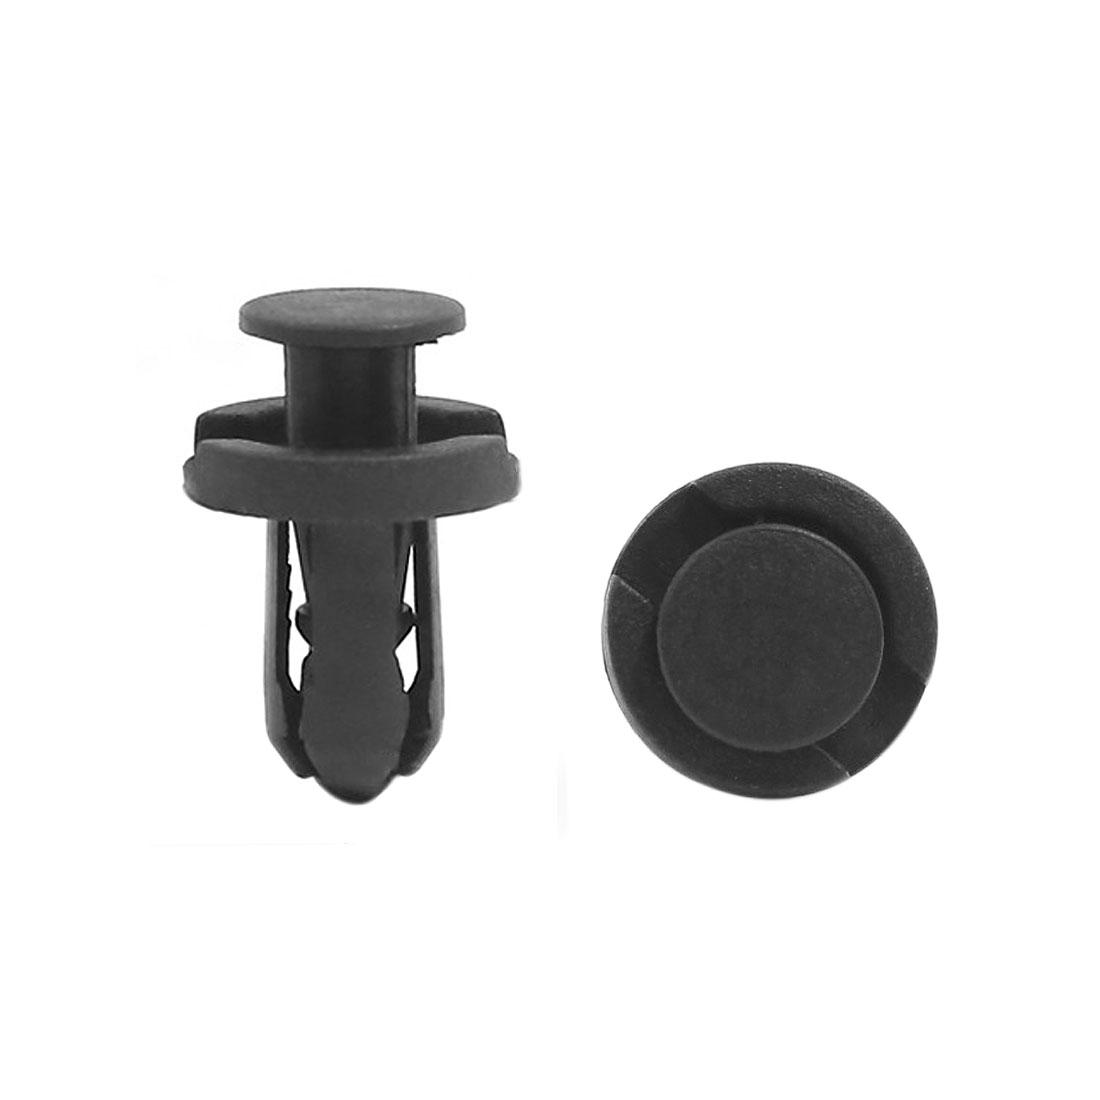 100 Pcs 10mm Hole Plastic Bumper Clips Panel Fastener Trim Clip Black For Honda